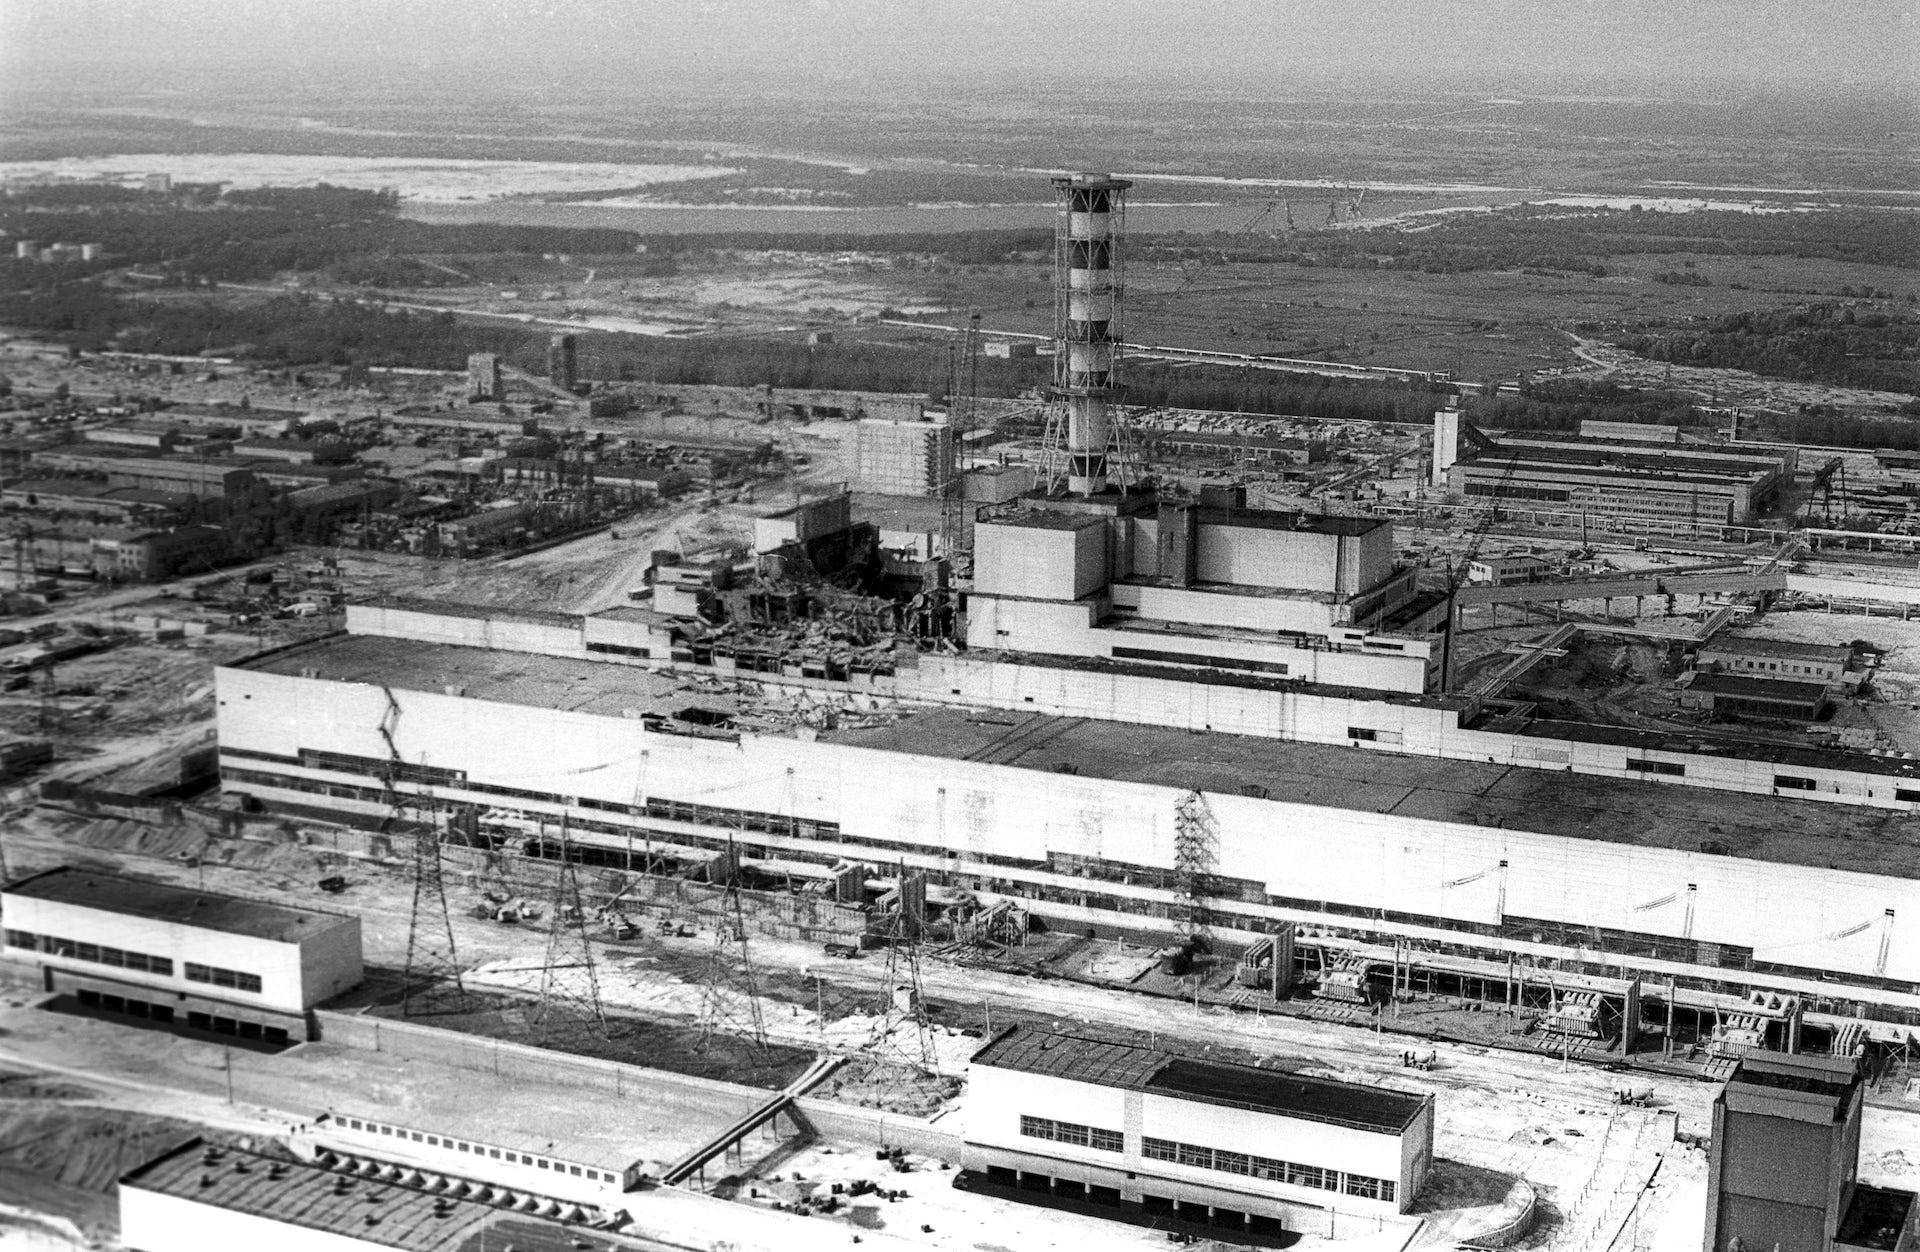 chernobyl effects on soil